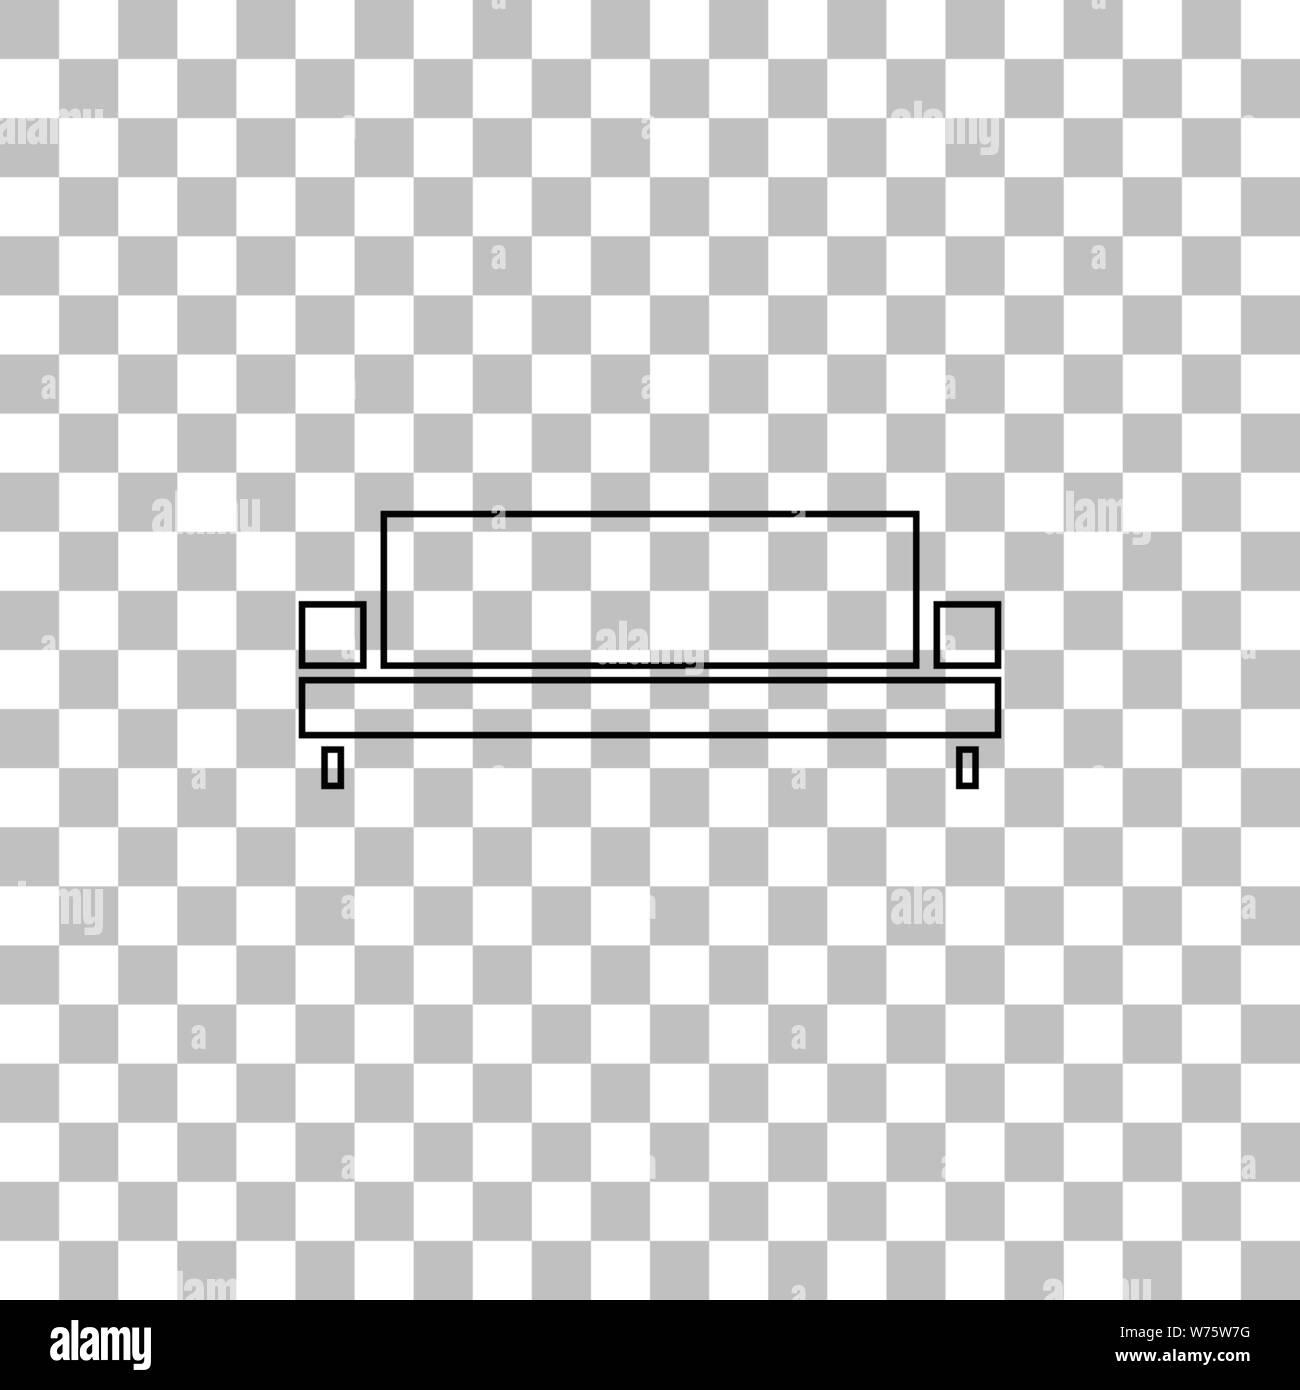 Brilliant Sofa Black Flat Icon On A Transparent Background Pictogram Theyellowbook Wood Chair Design Ideas Theyellowbookinfo